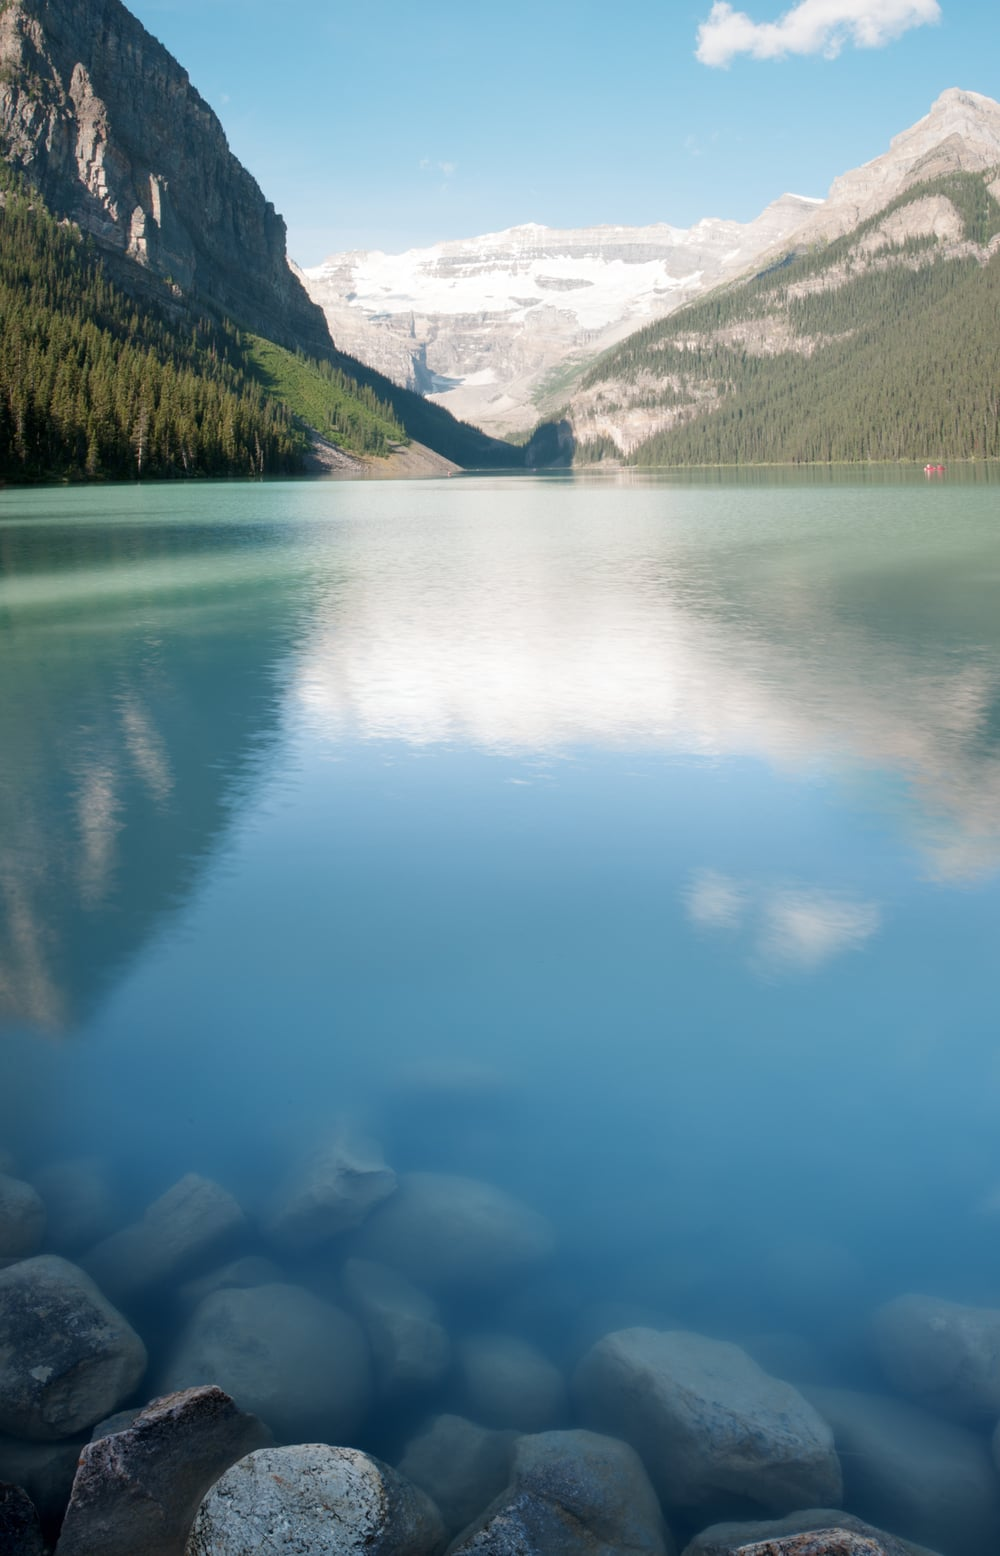 Lake Louise, Banff National Park, Alberta 2015